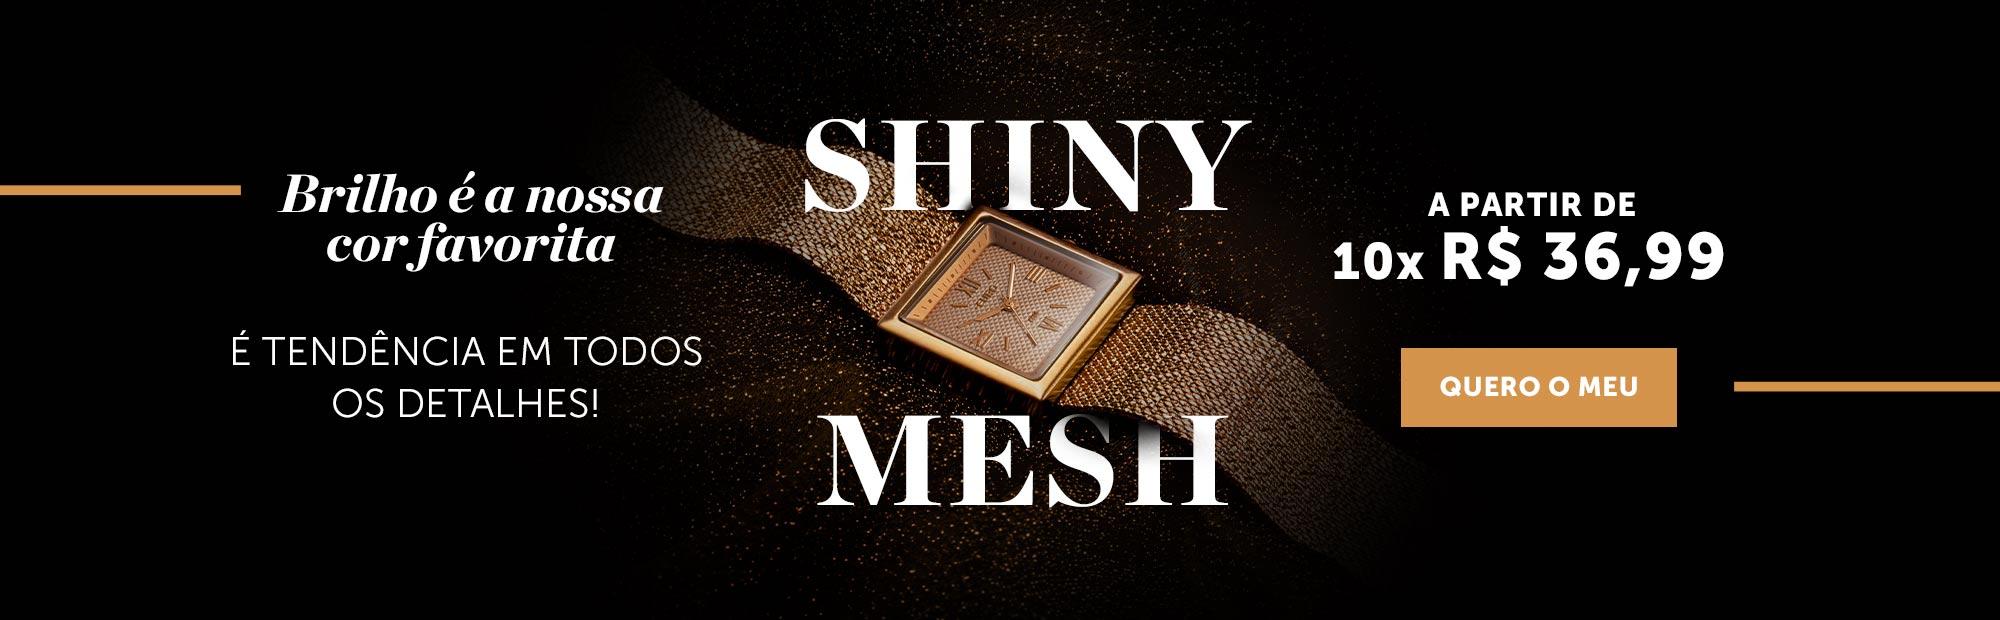 Shiny Mesh